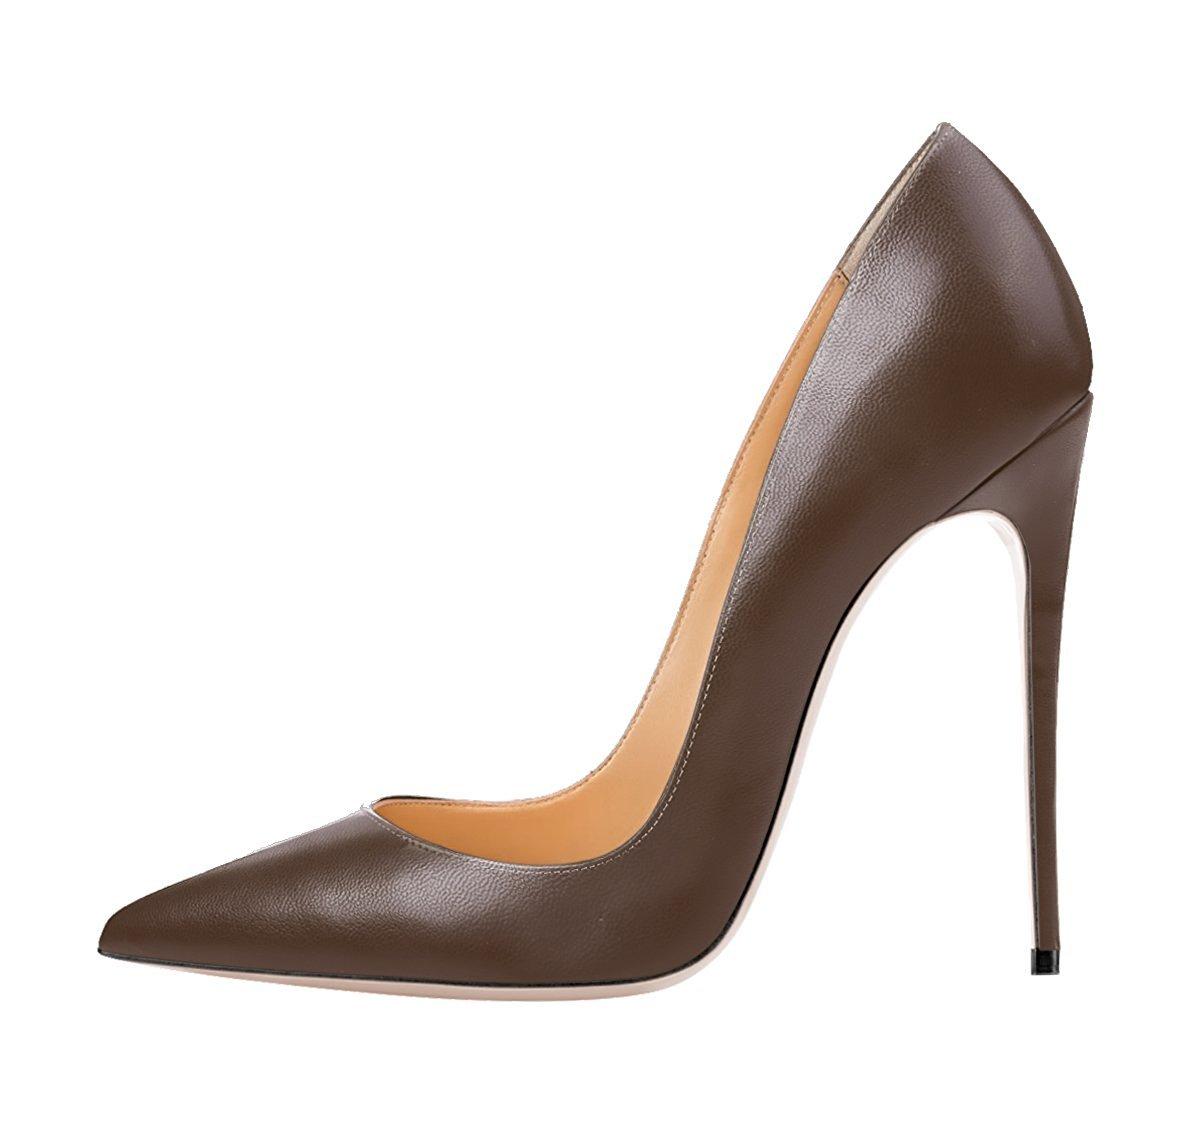 Jushee Damen Sexy Klassische Schwarz Stiletto High Heels Kleid Buuml;ro Pumps38 EU|Braun02